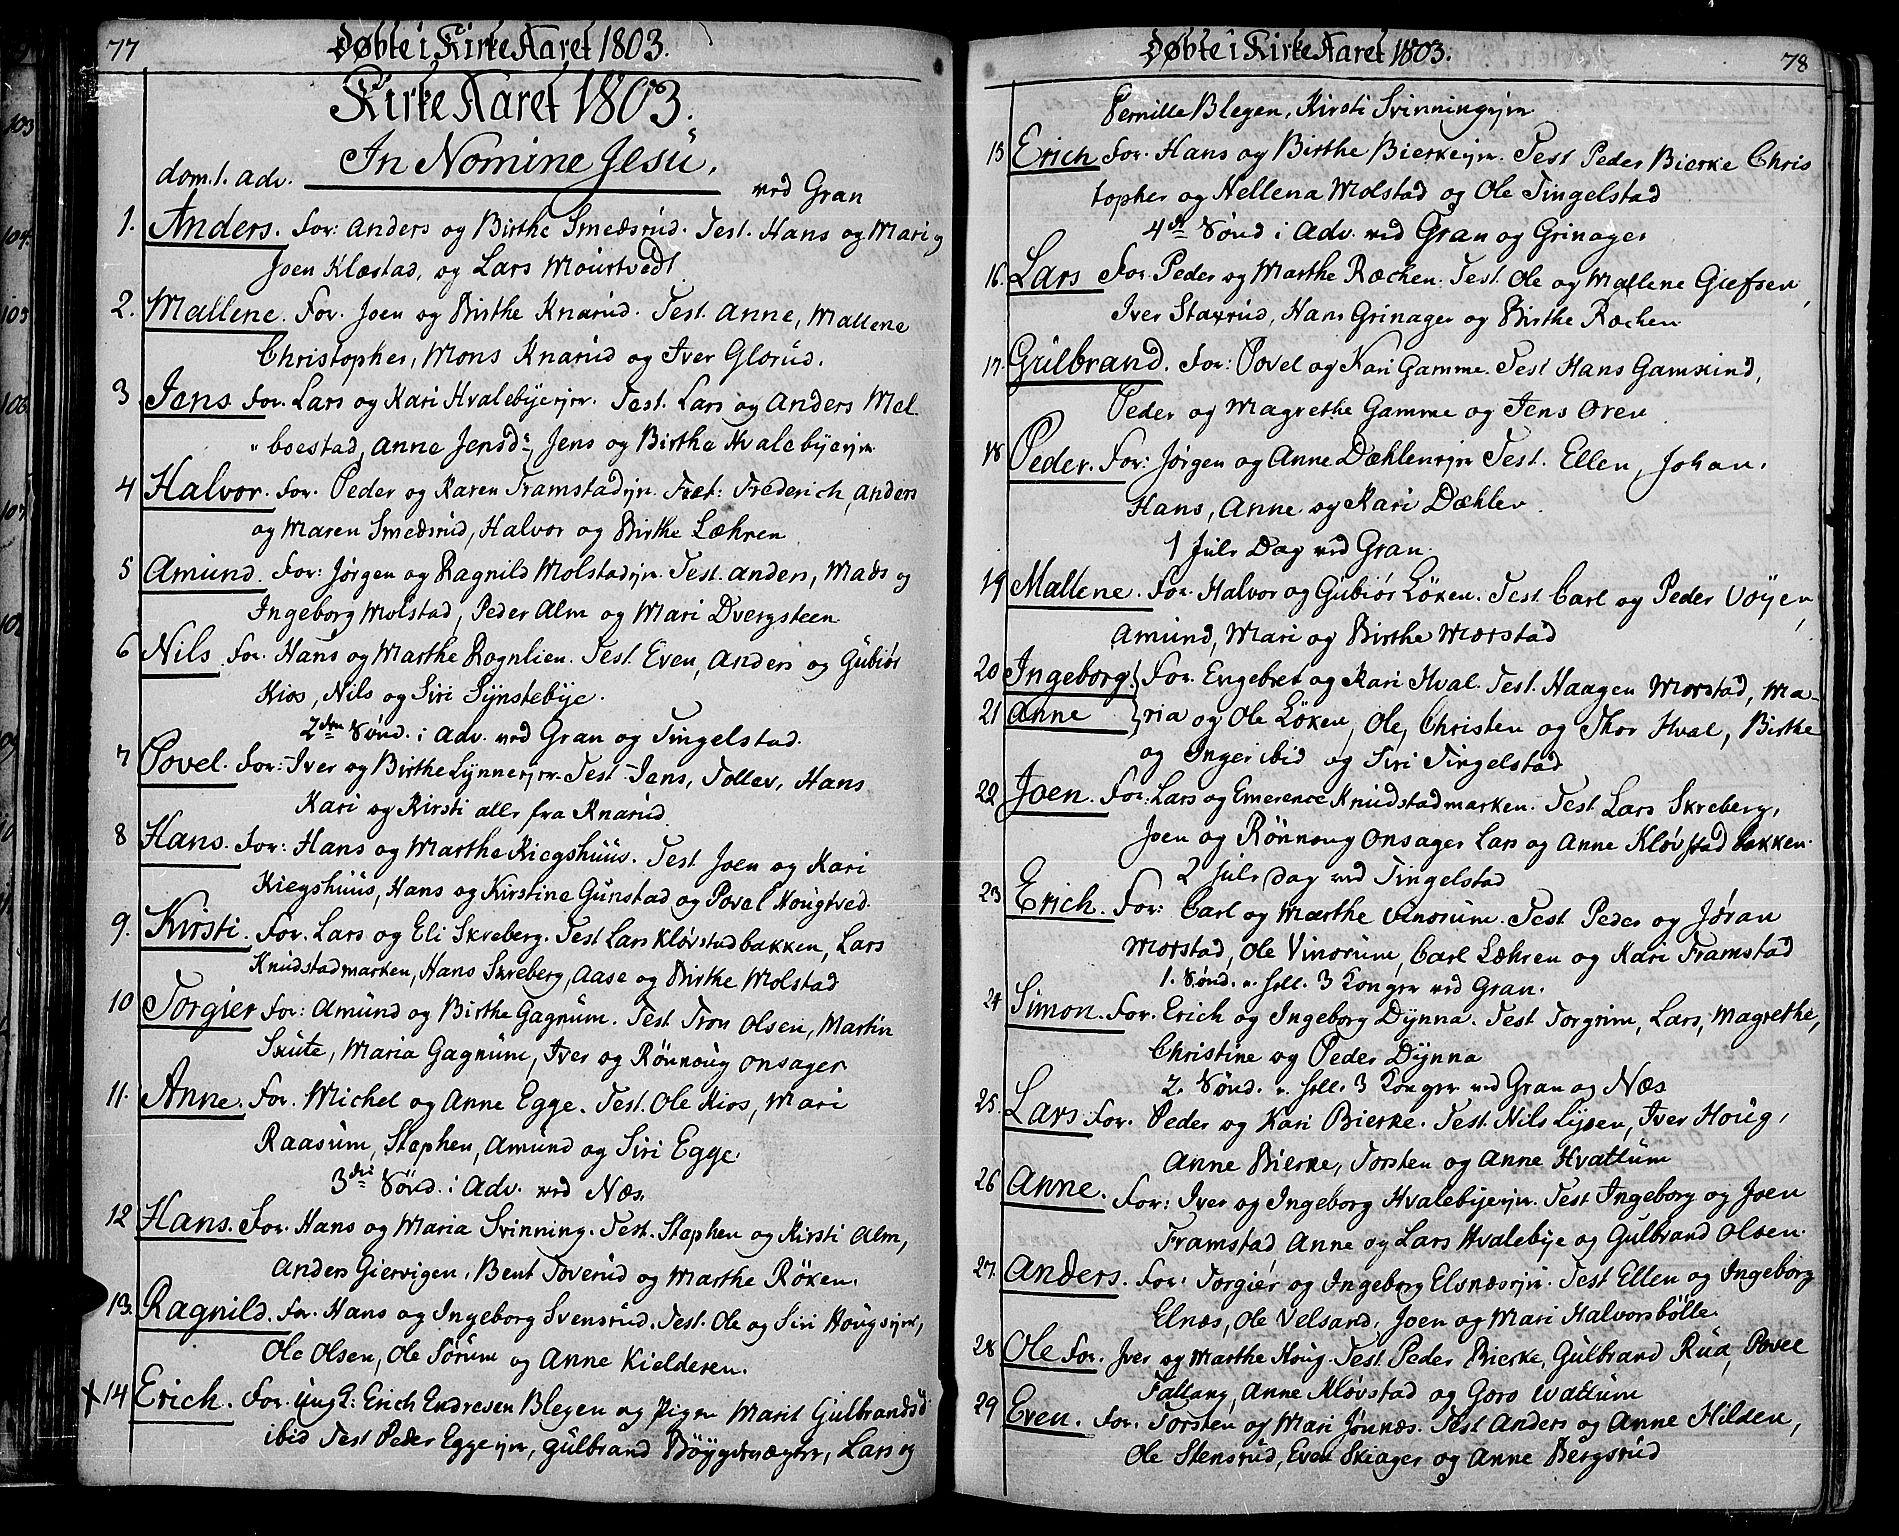 SAH, Gran prestekontor, Ministerialbok nr. 8, 1798-1811, s. 77-78